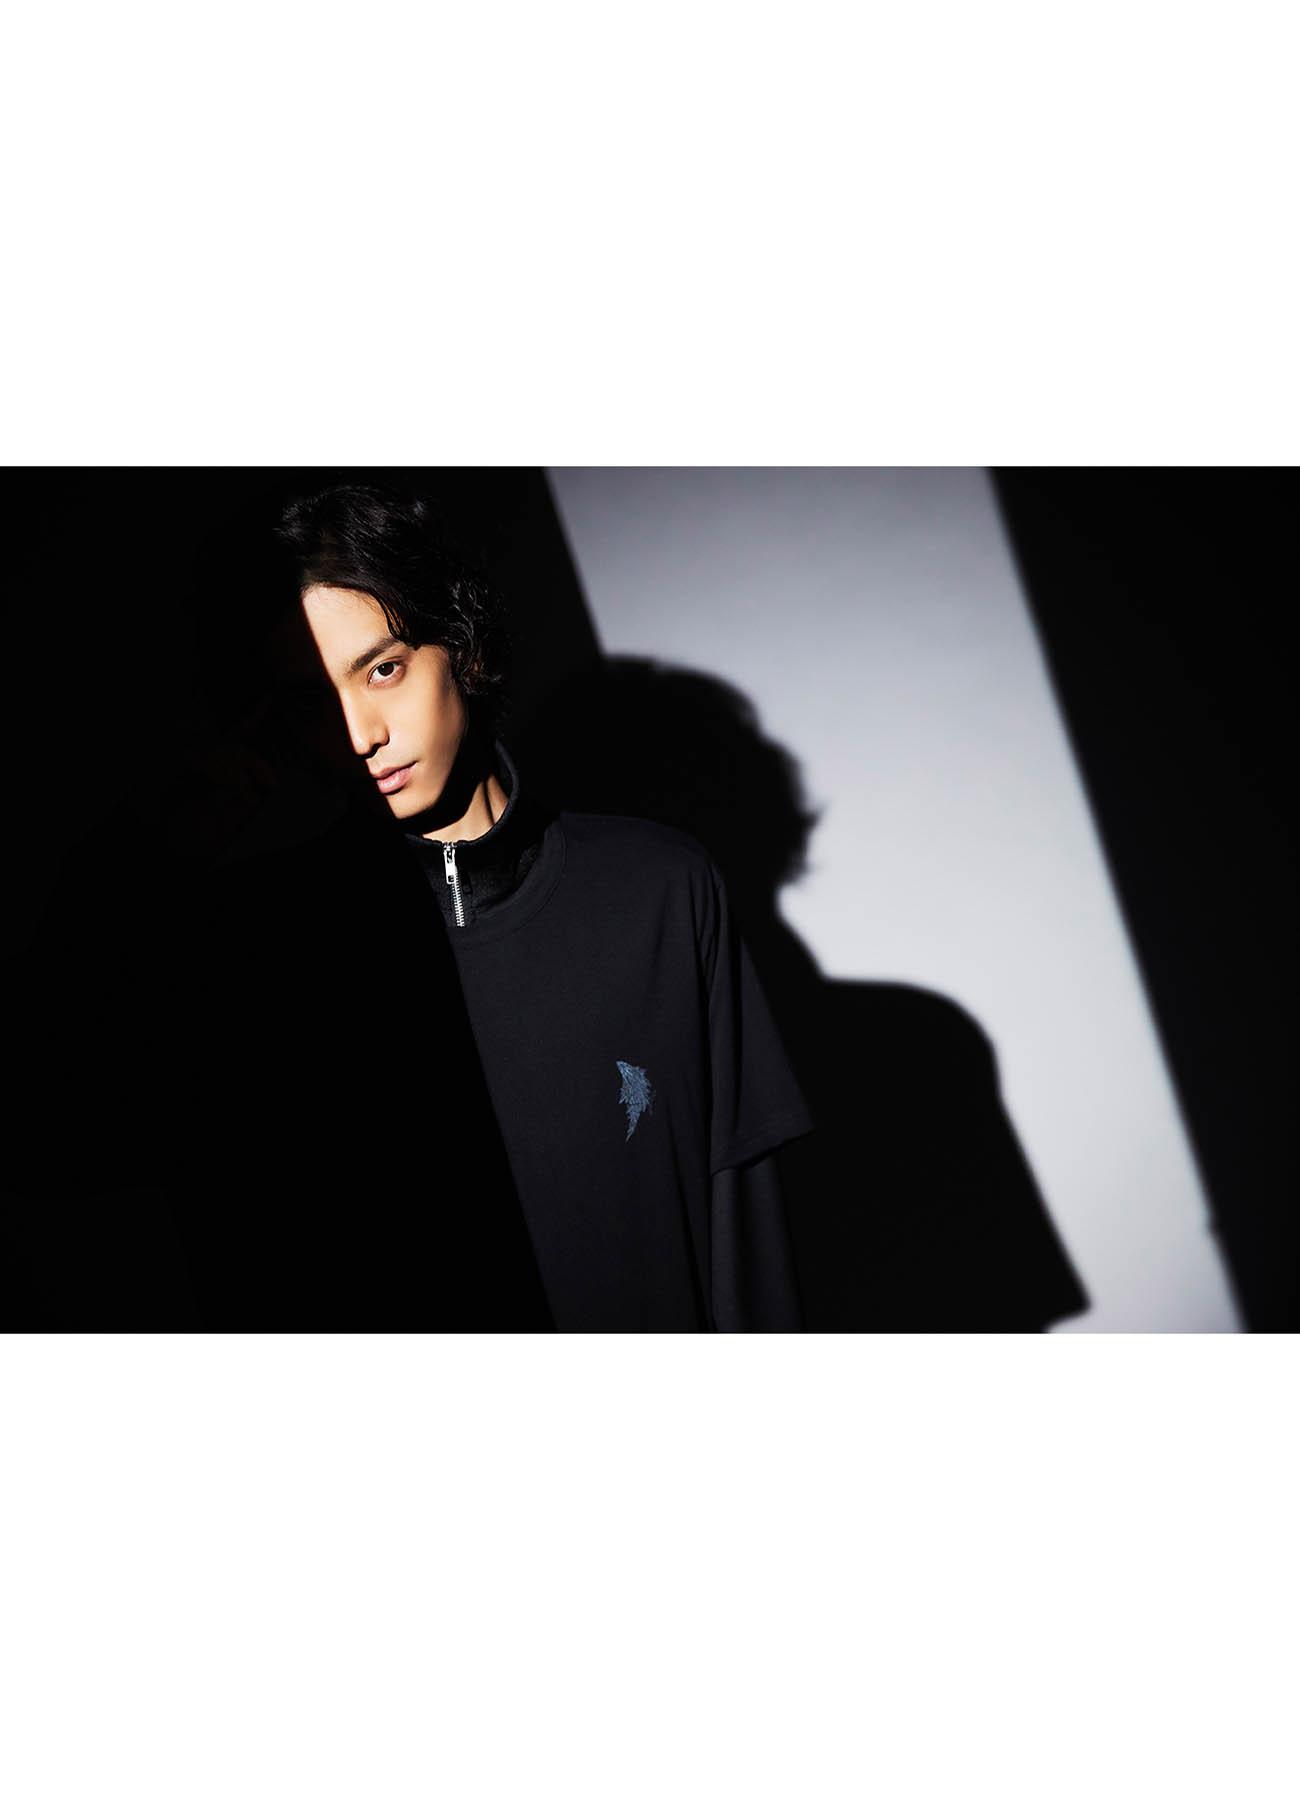 <発売日調整中> [Reborn] Back Graphic T by 黒羽麻璃央